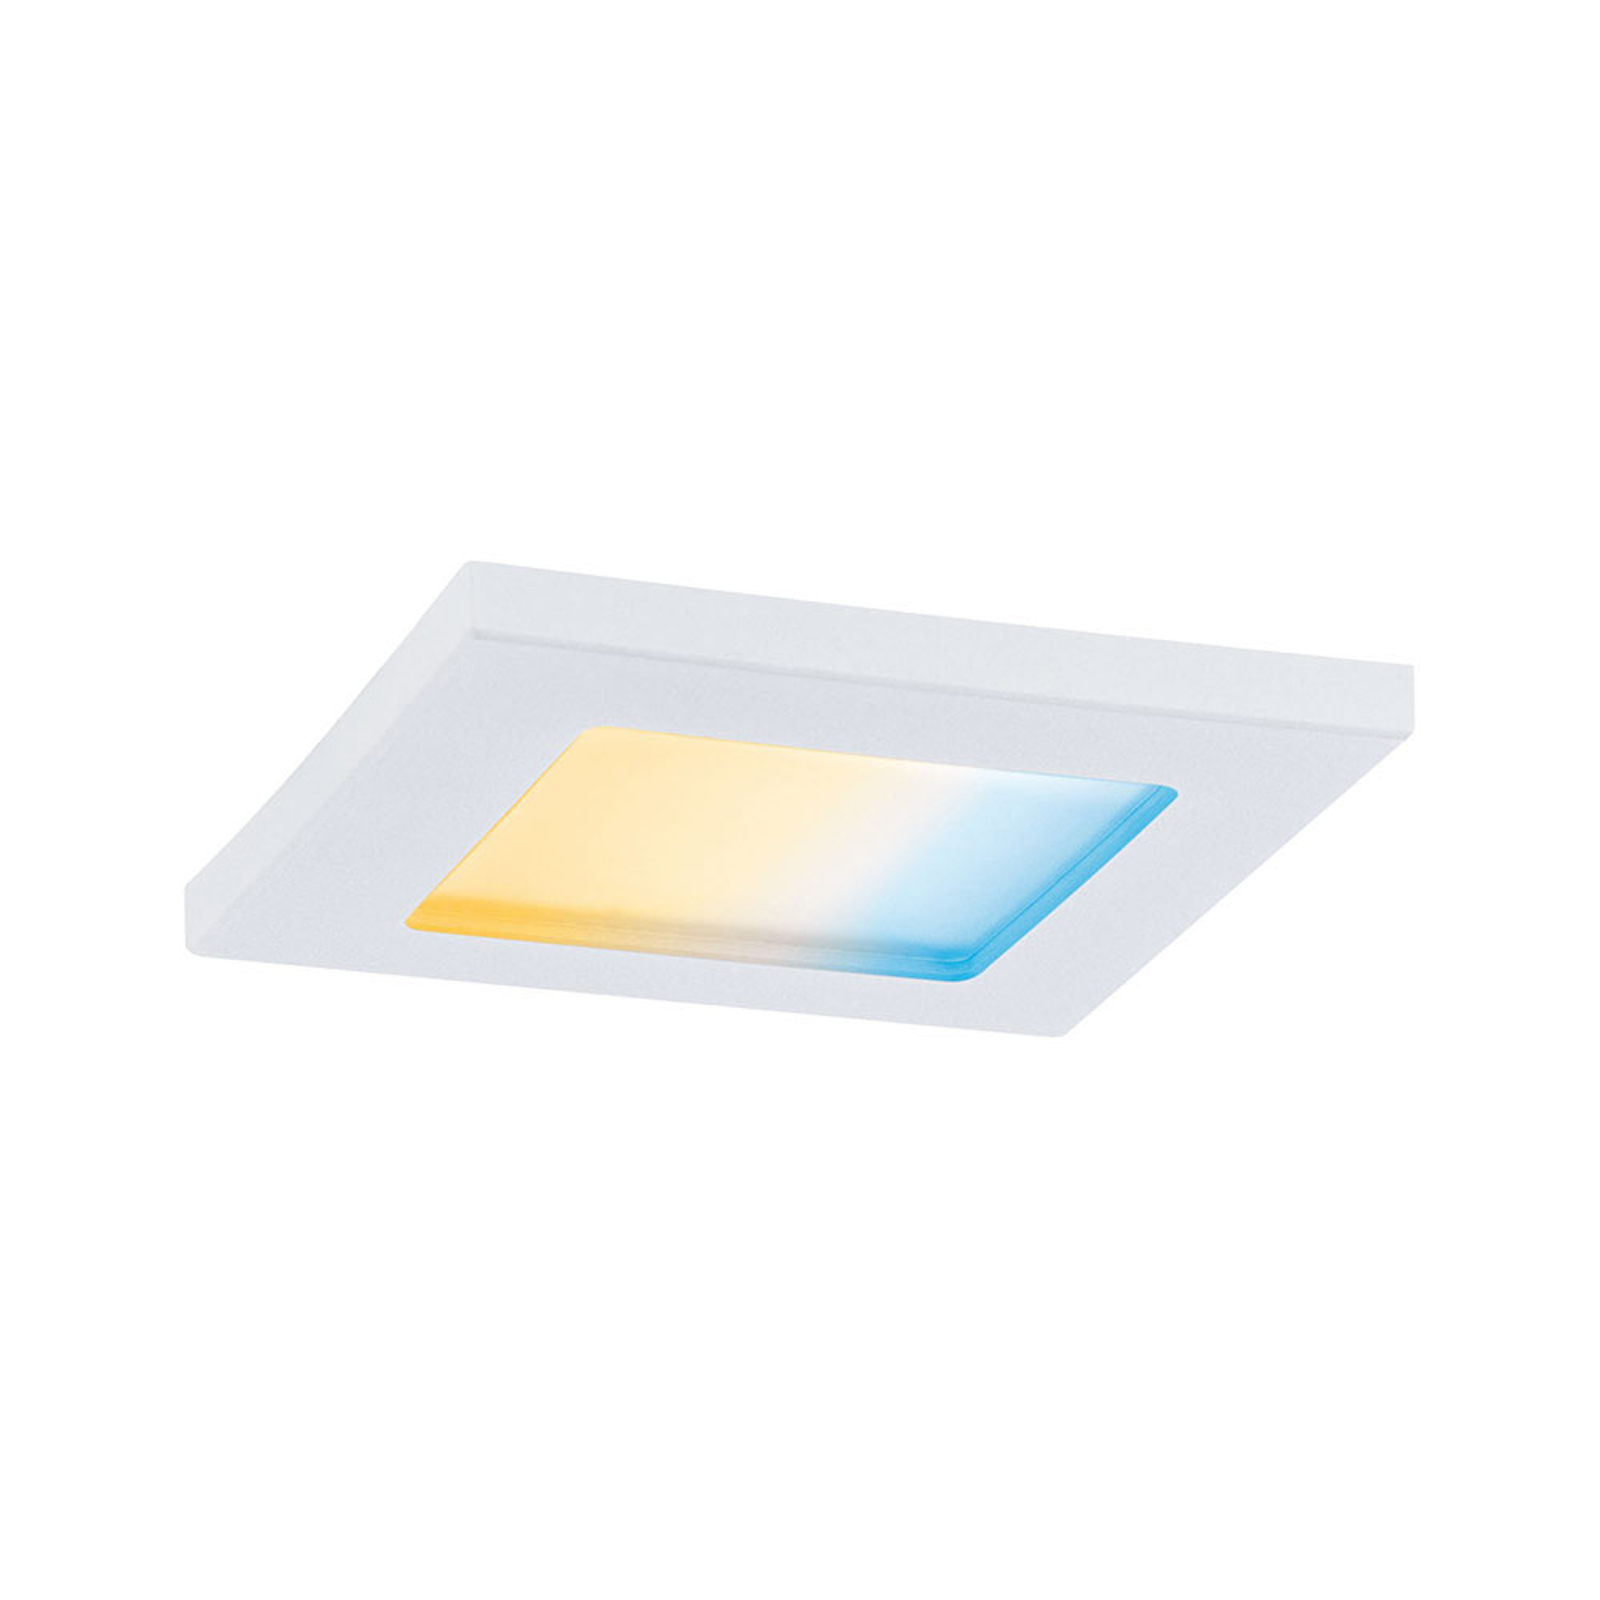 Paulmann Clever Connect Pola lampa do mebli, biała